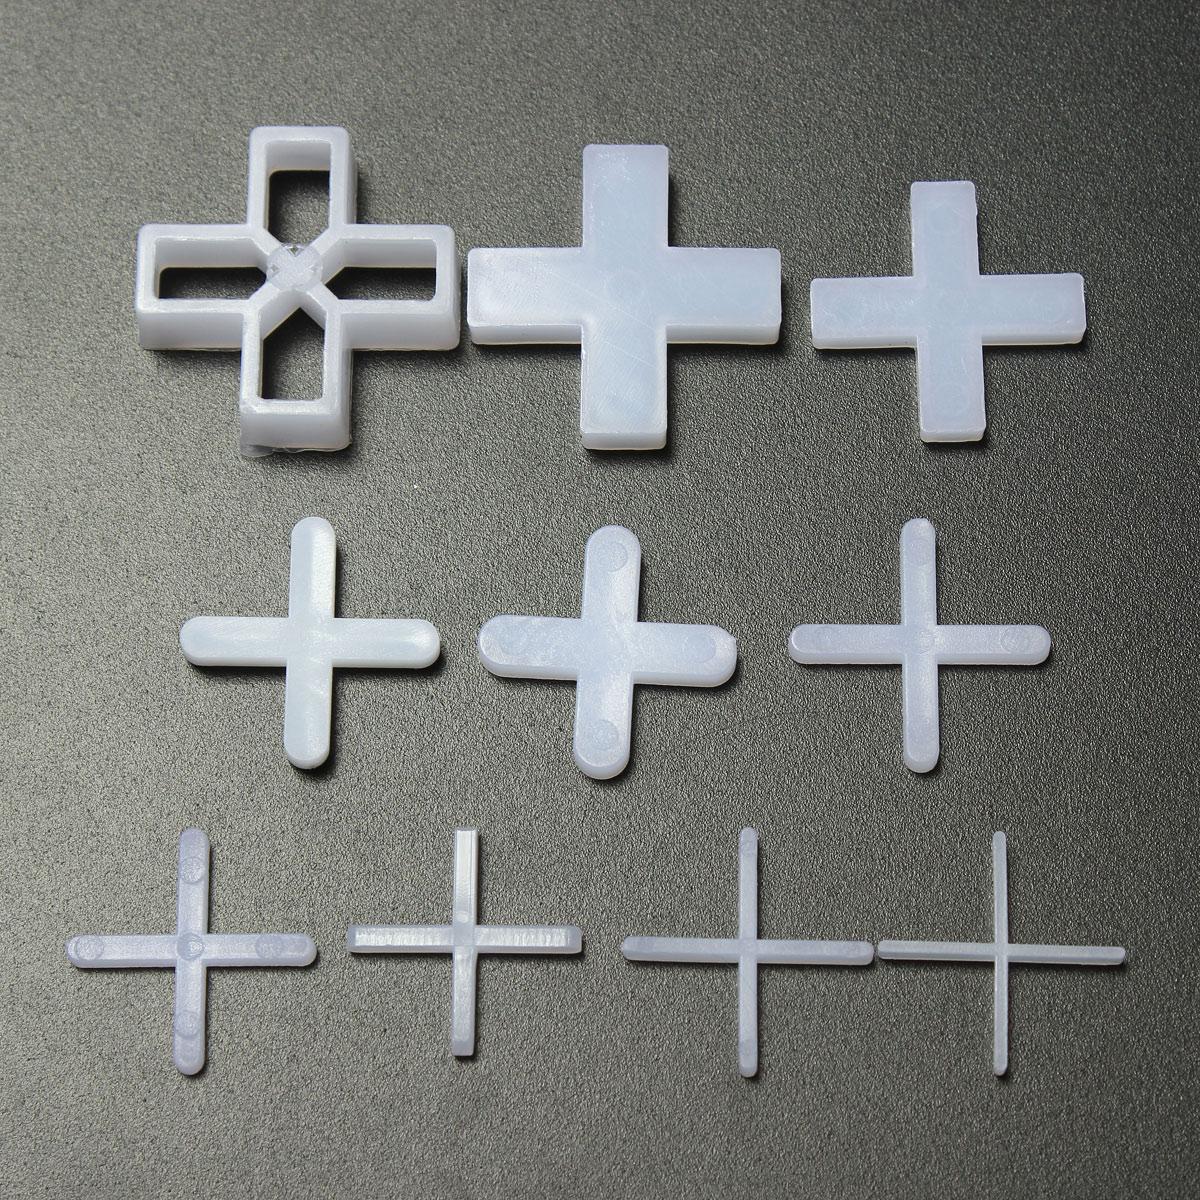 100 Wall Floor Tile Spacers Cross 1mm 5mm 10mm Tiling